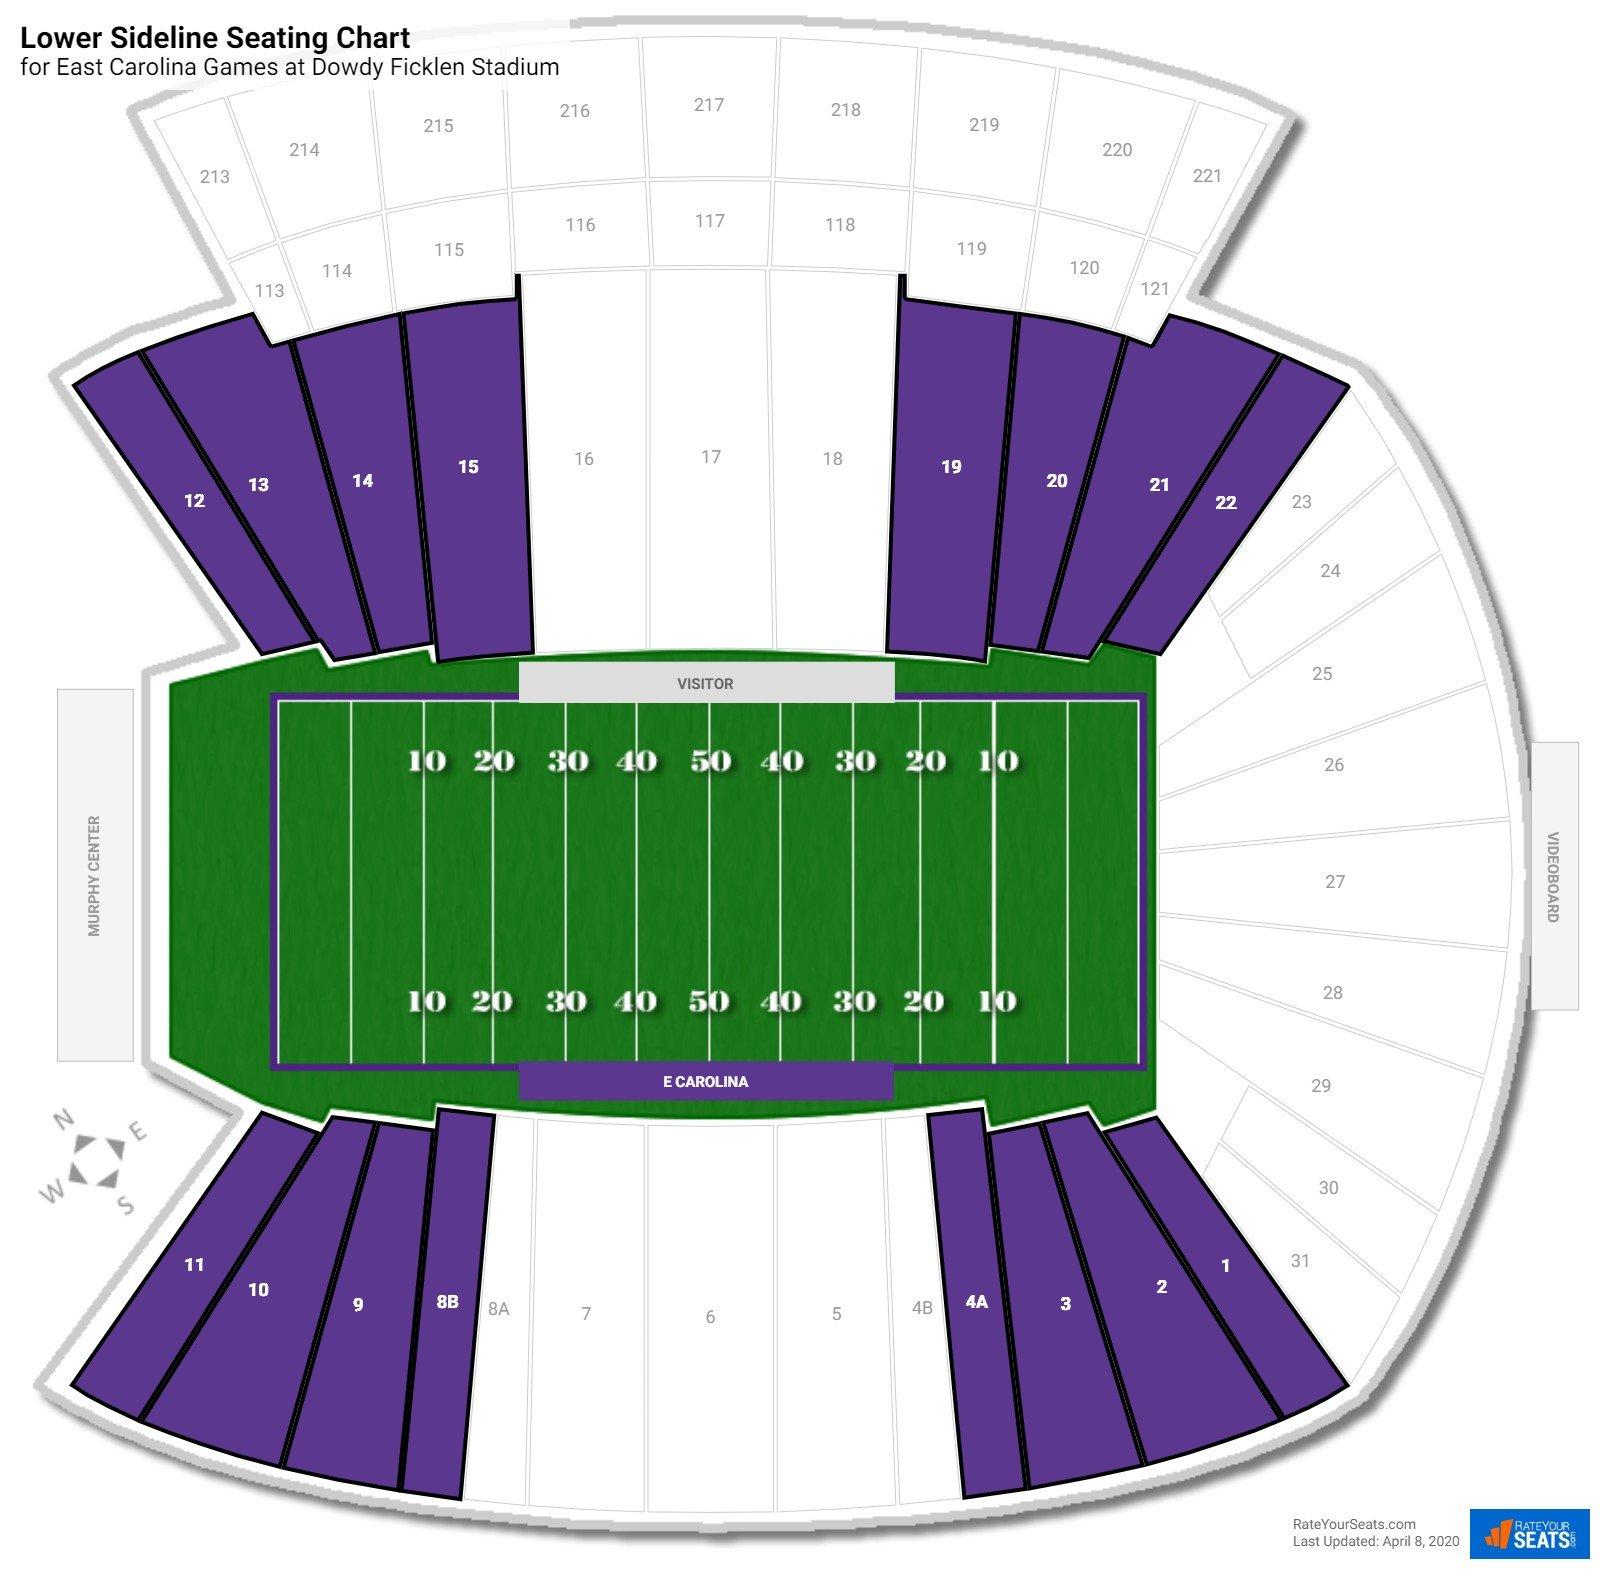 Ecu Stadium Seating Chart Brokeasshome Com